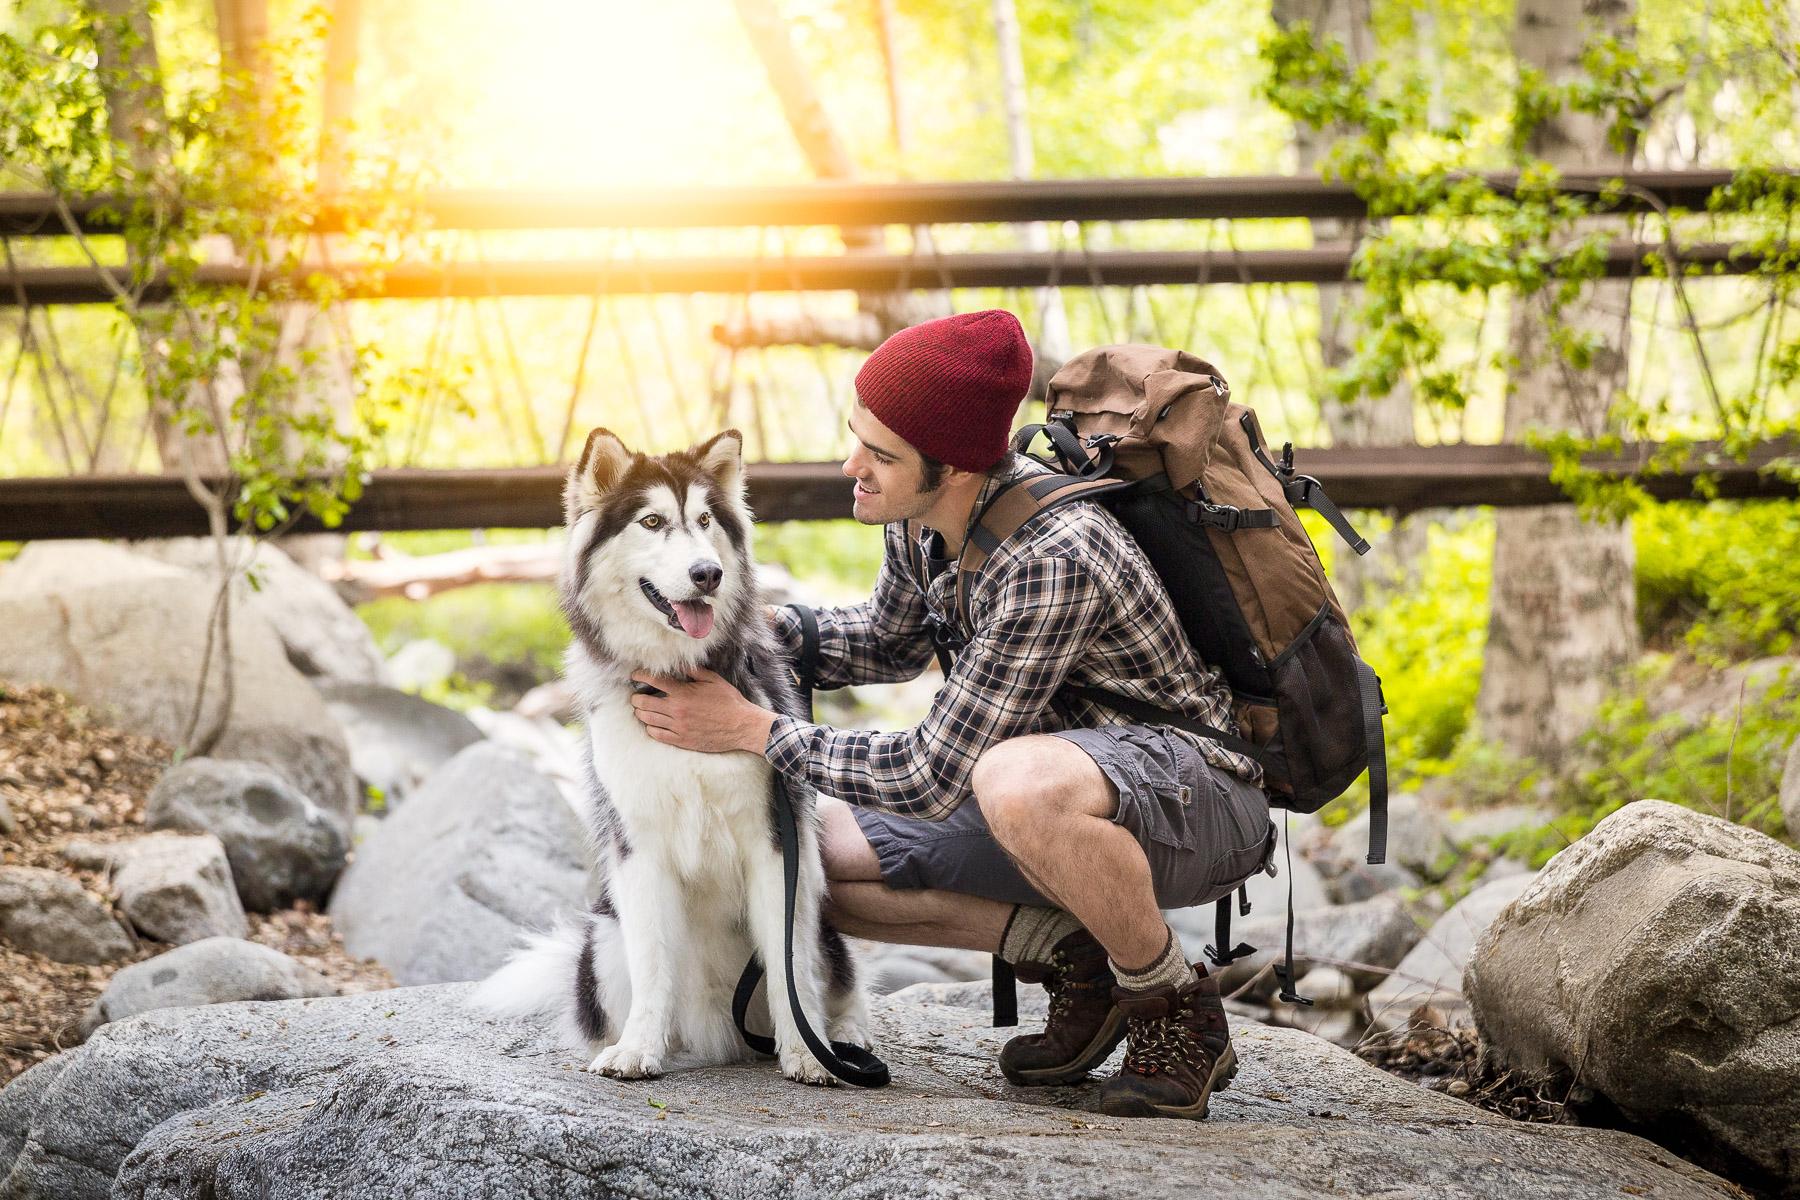 husky-dog-and-man-on-river-hike-woods-together-dog-photography.jpg